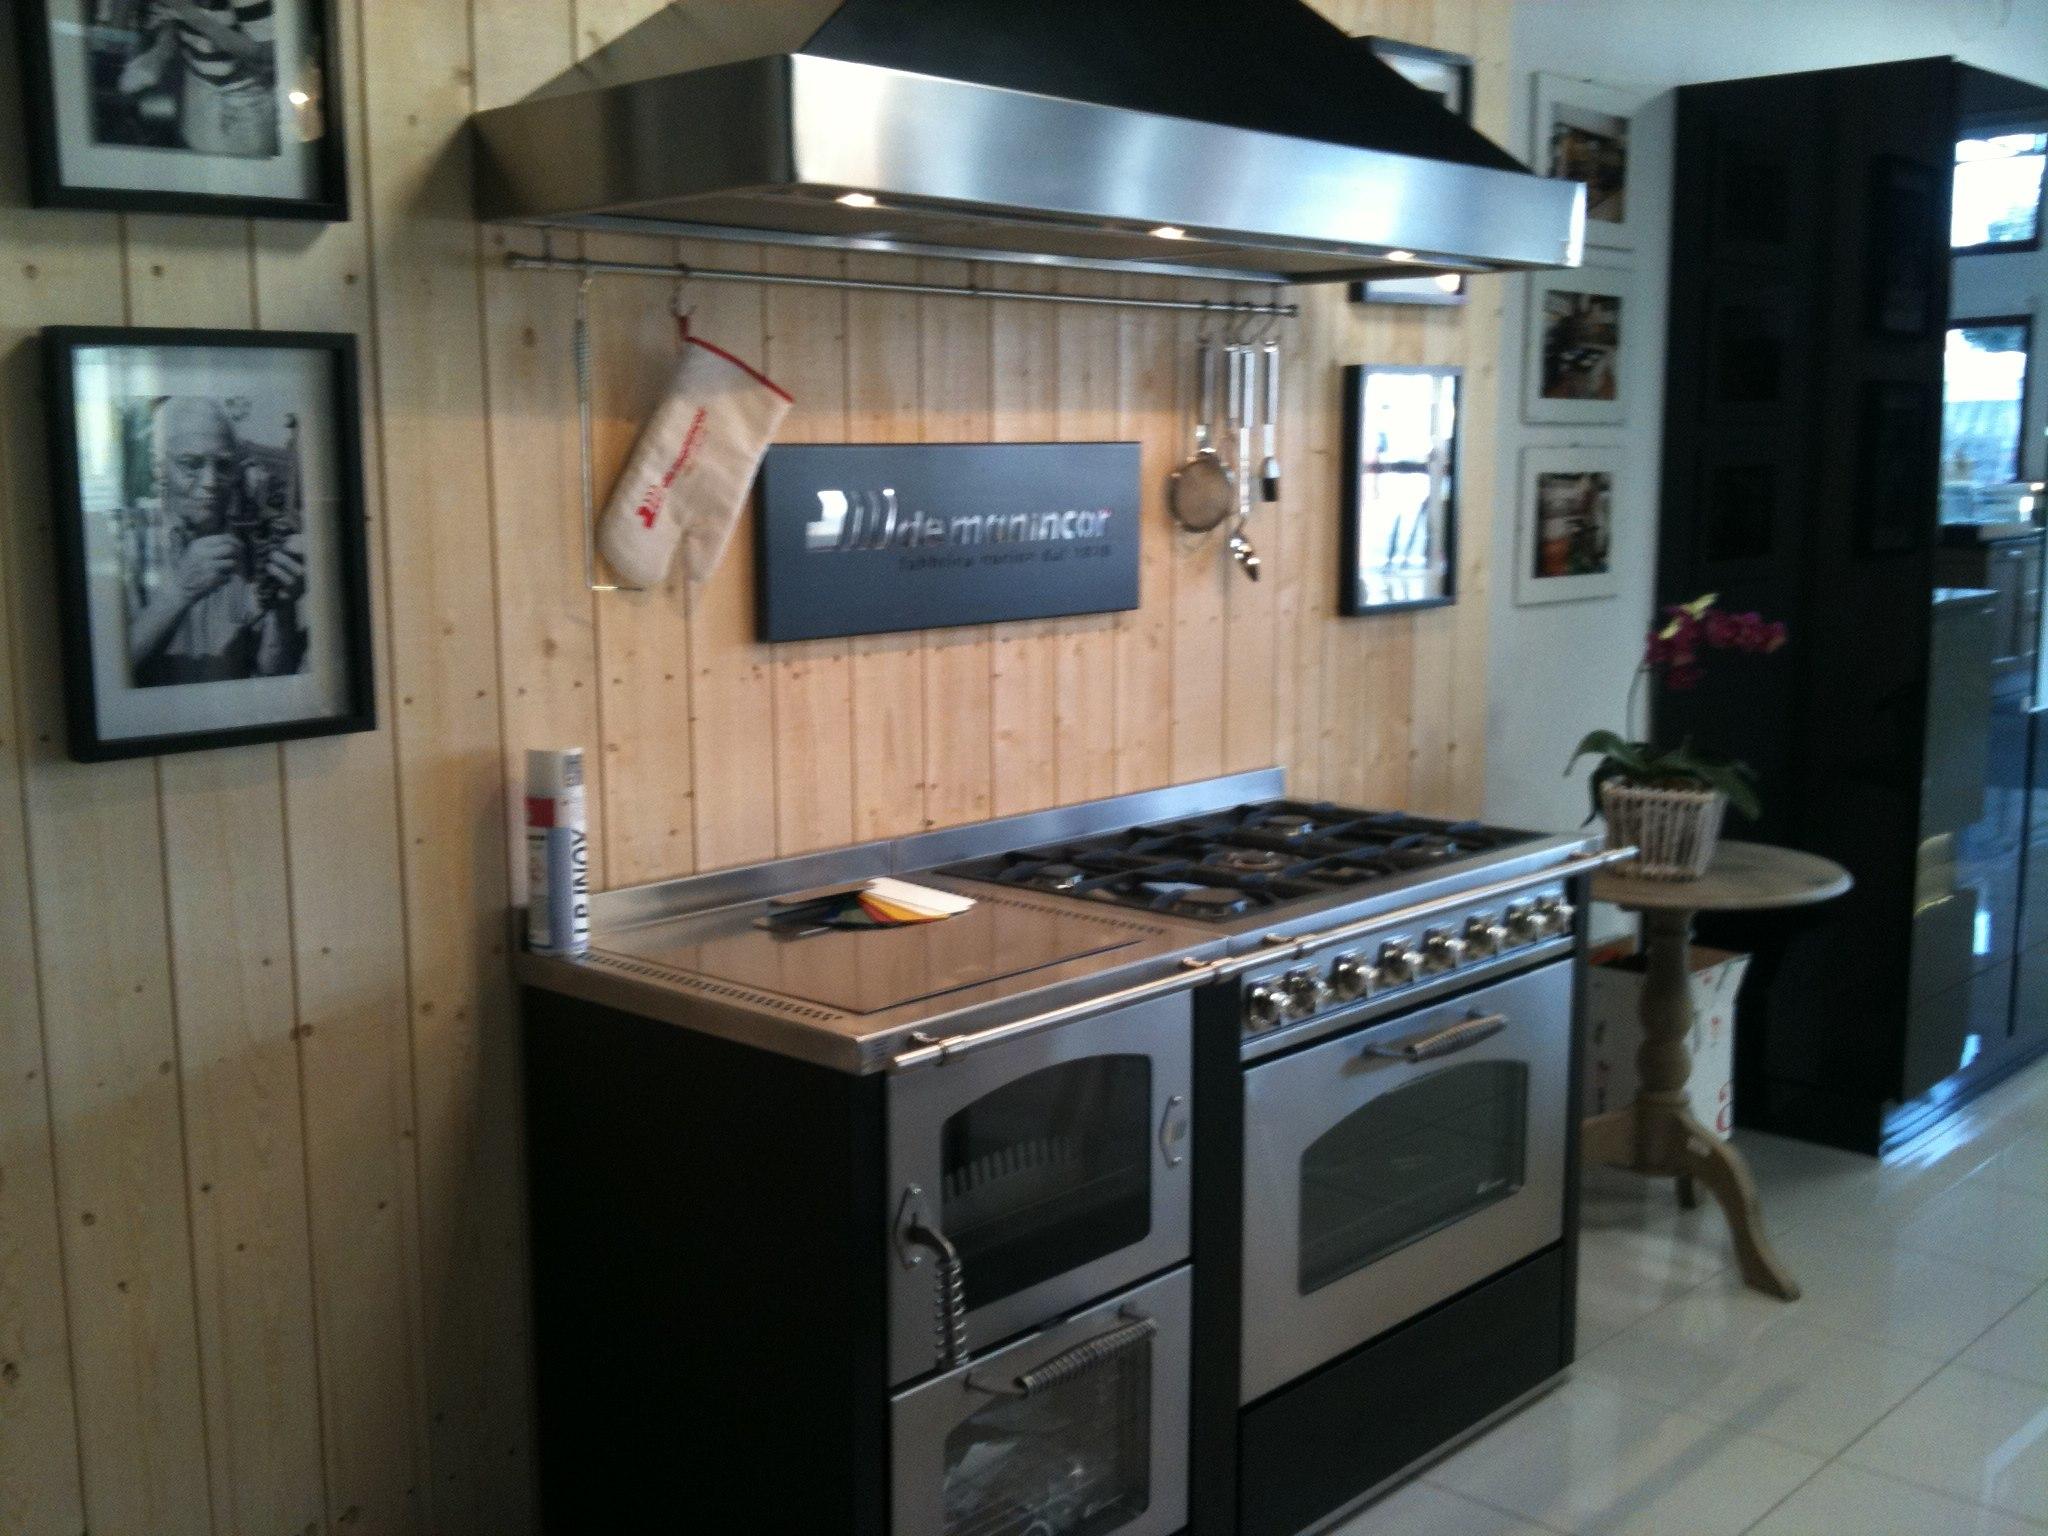 Combinacion cocina le a gas de manincor dpm especialidades for Campanas de cocina de diseno